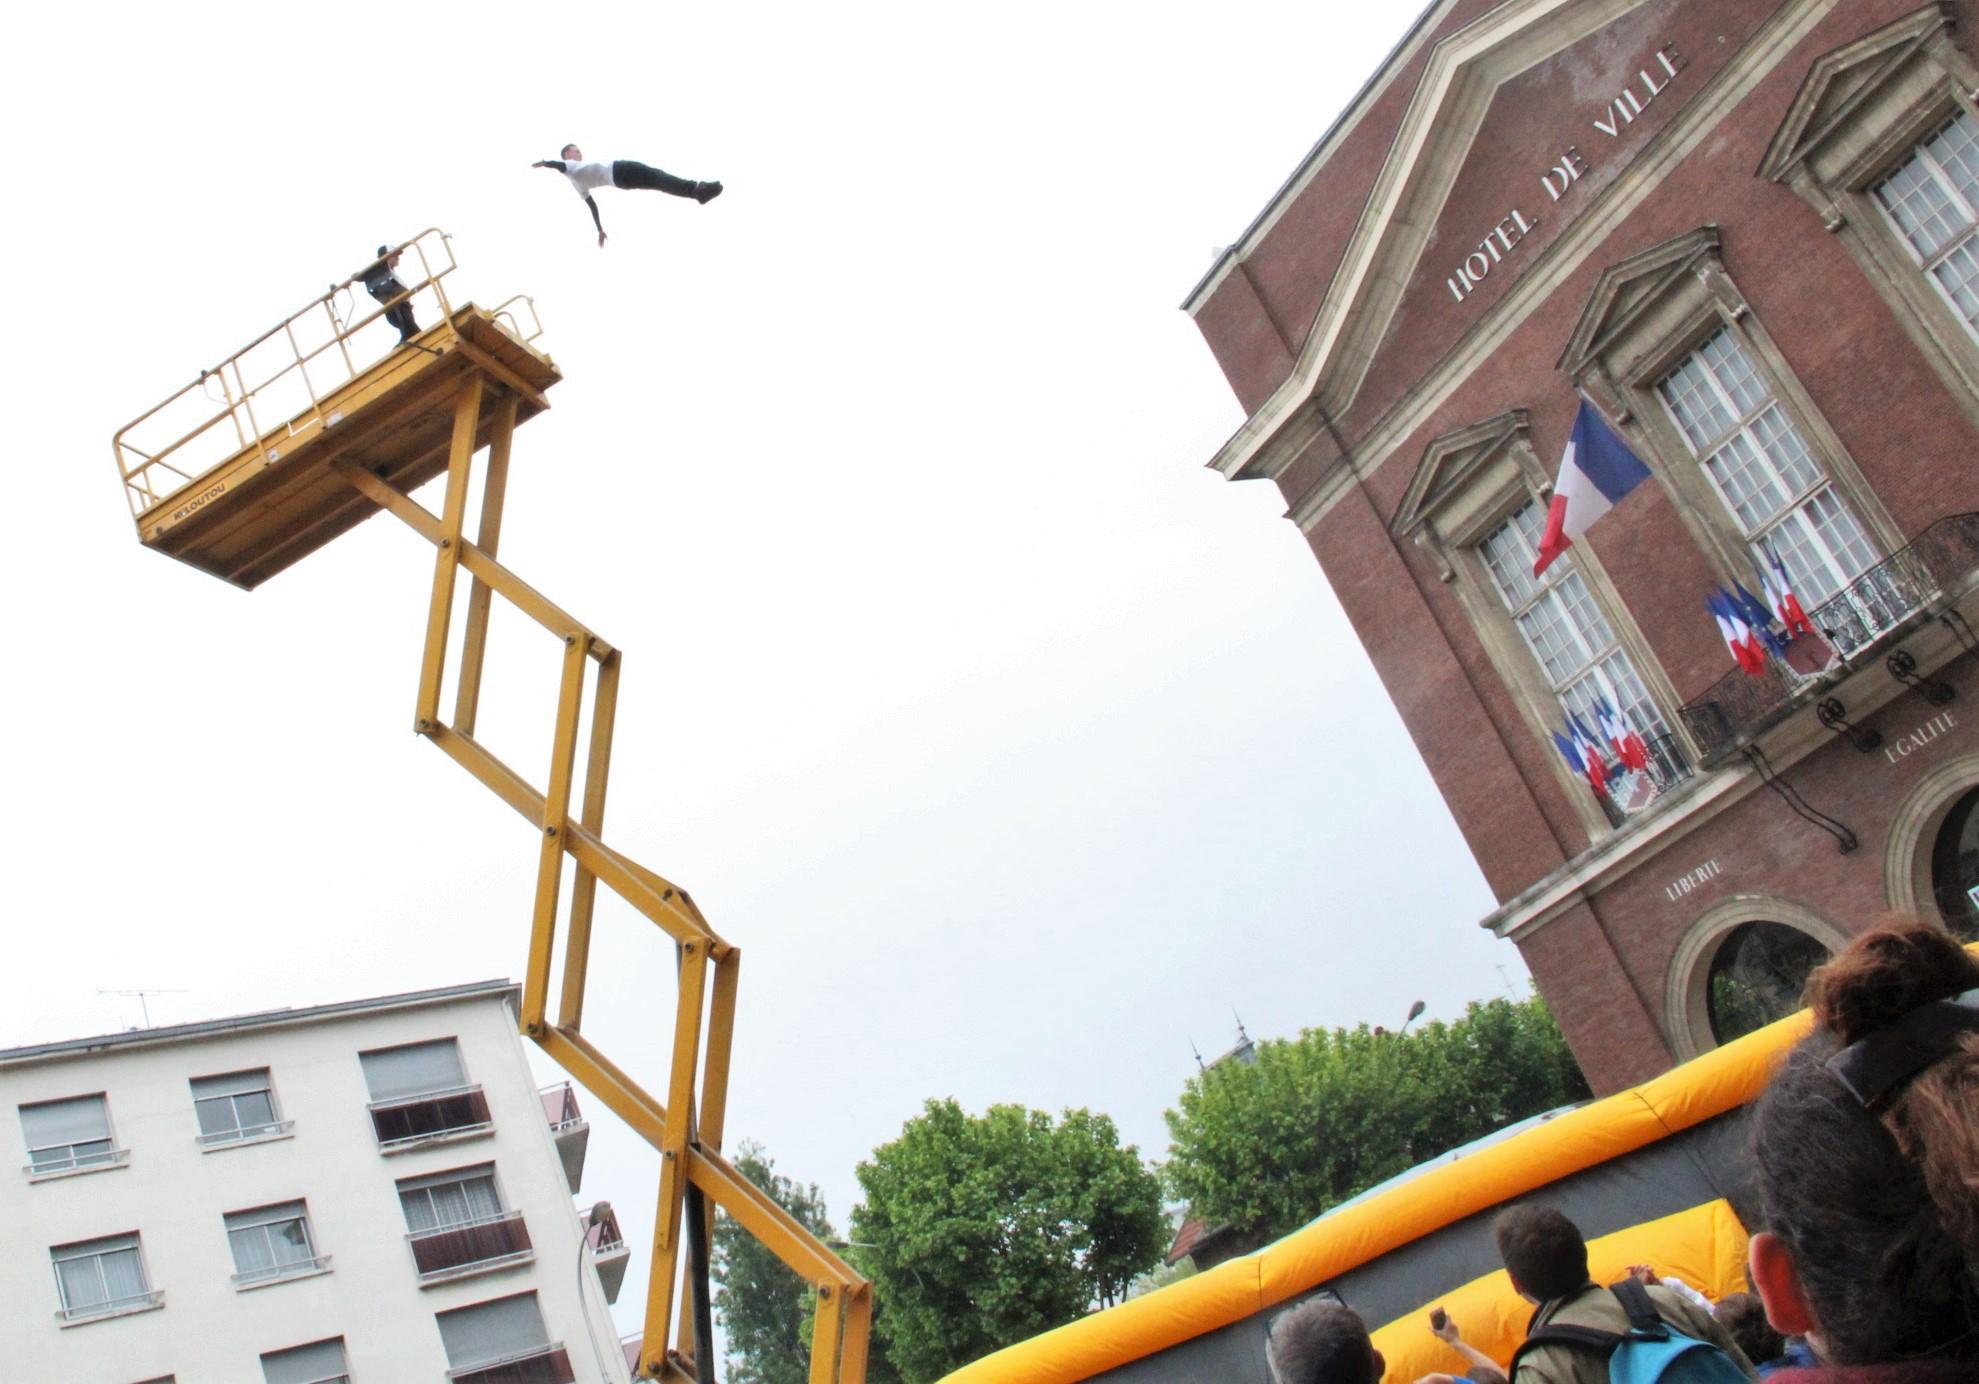 Xtrem Jump Stunt Show Events